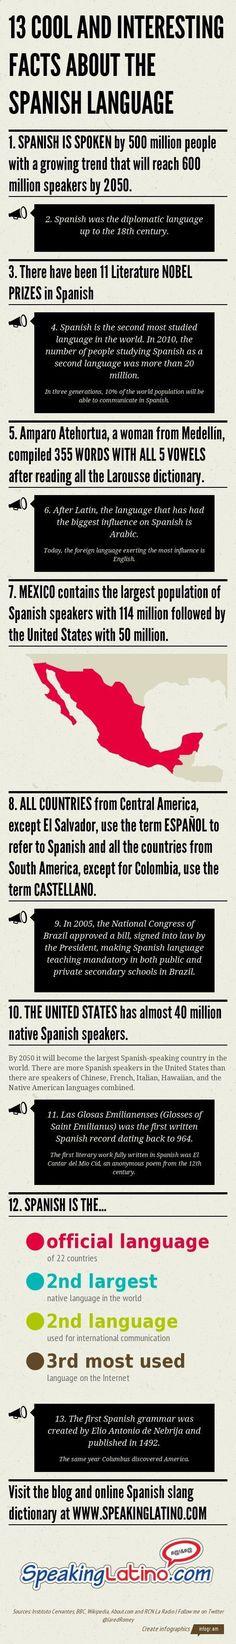 Facts About Spanish Language Infographic espanishlessons.c...